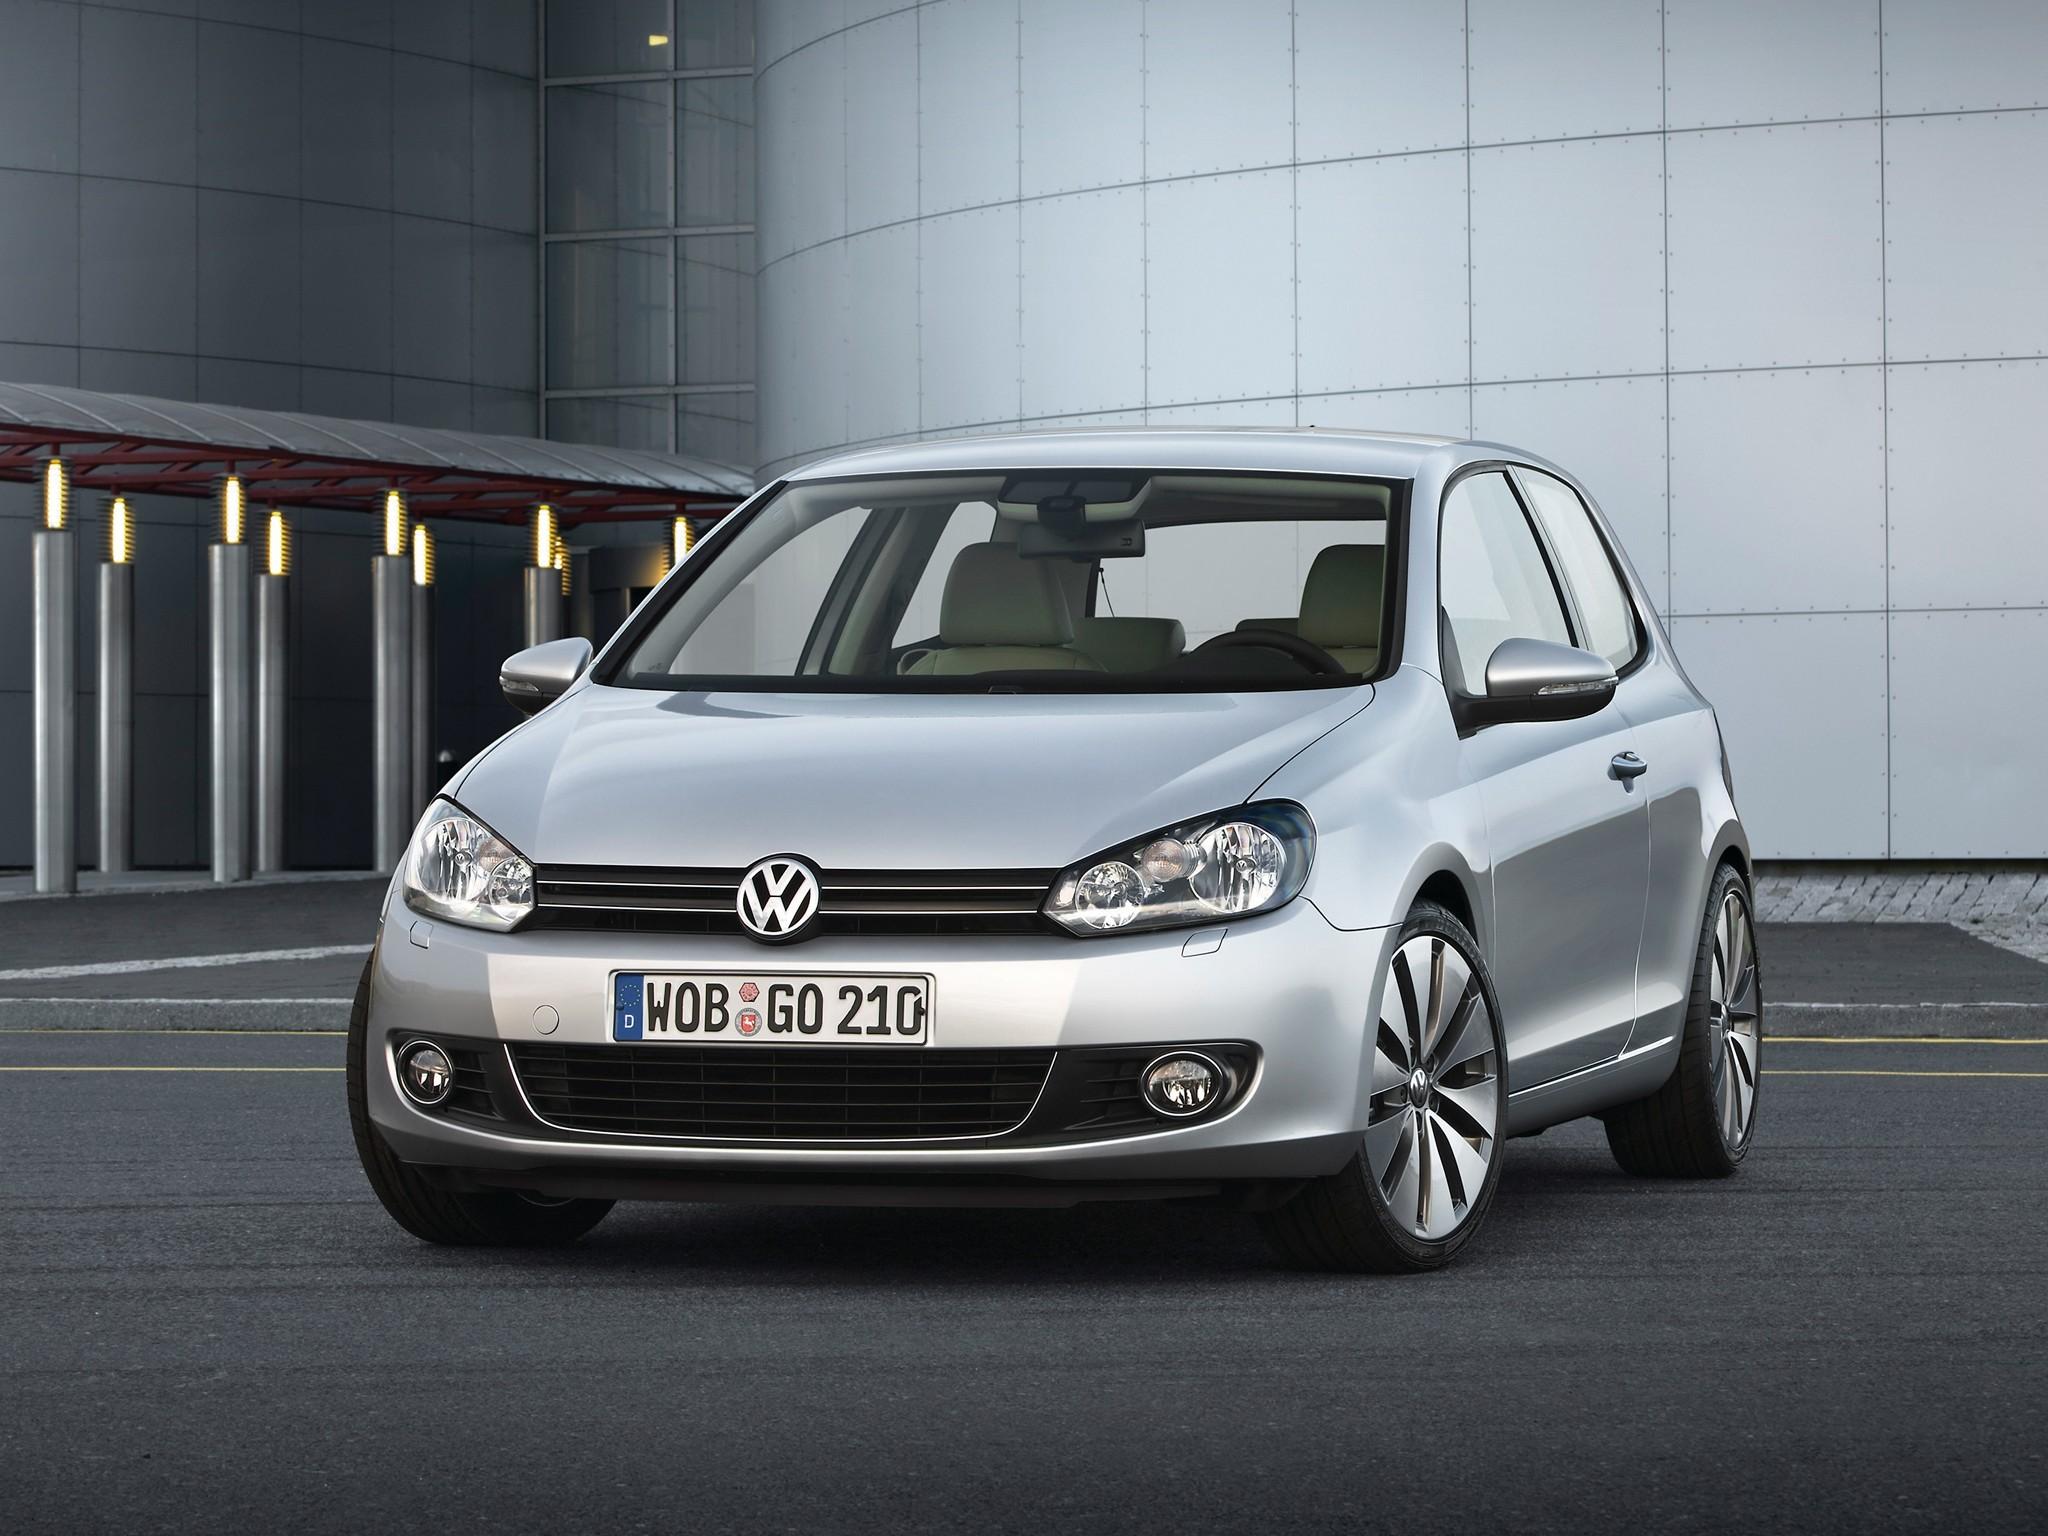 Tuning Files Volkswagen Golf 6 2.0 TDI CR 140hp